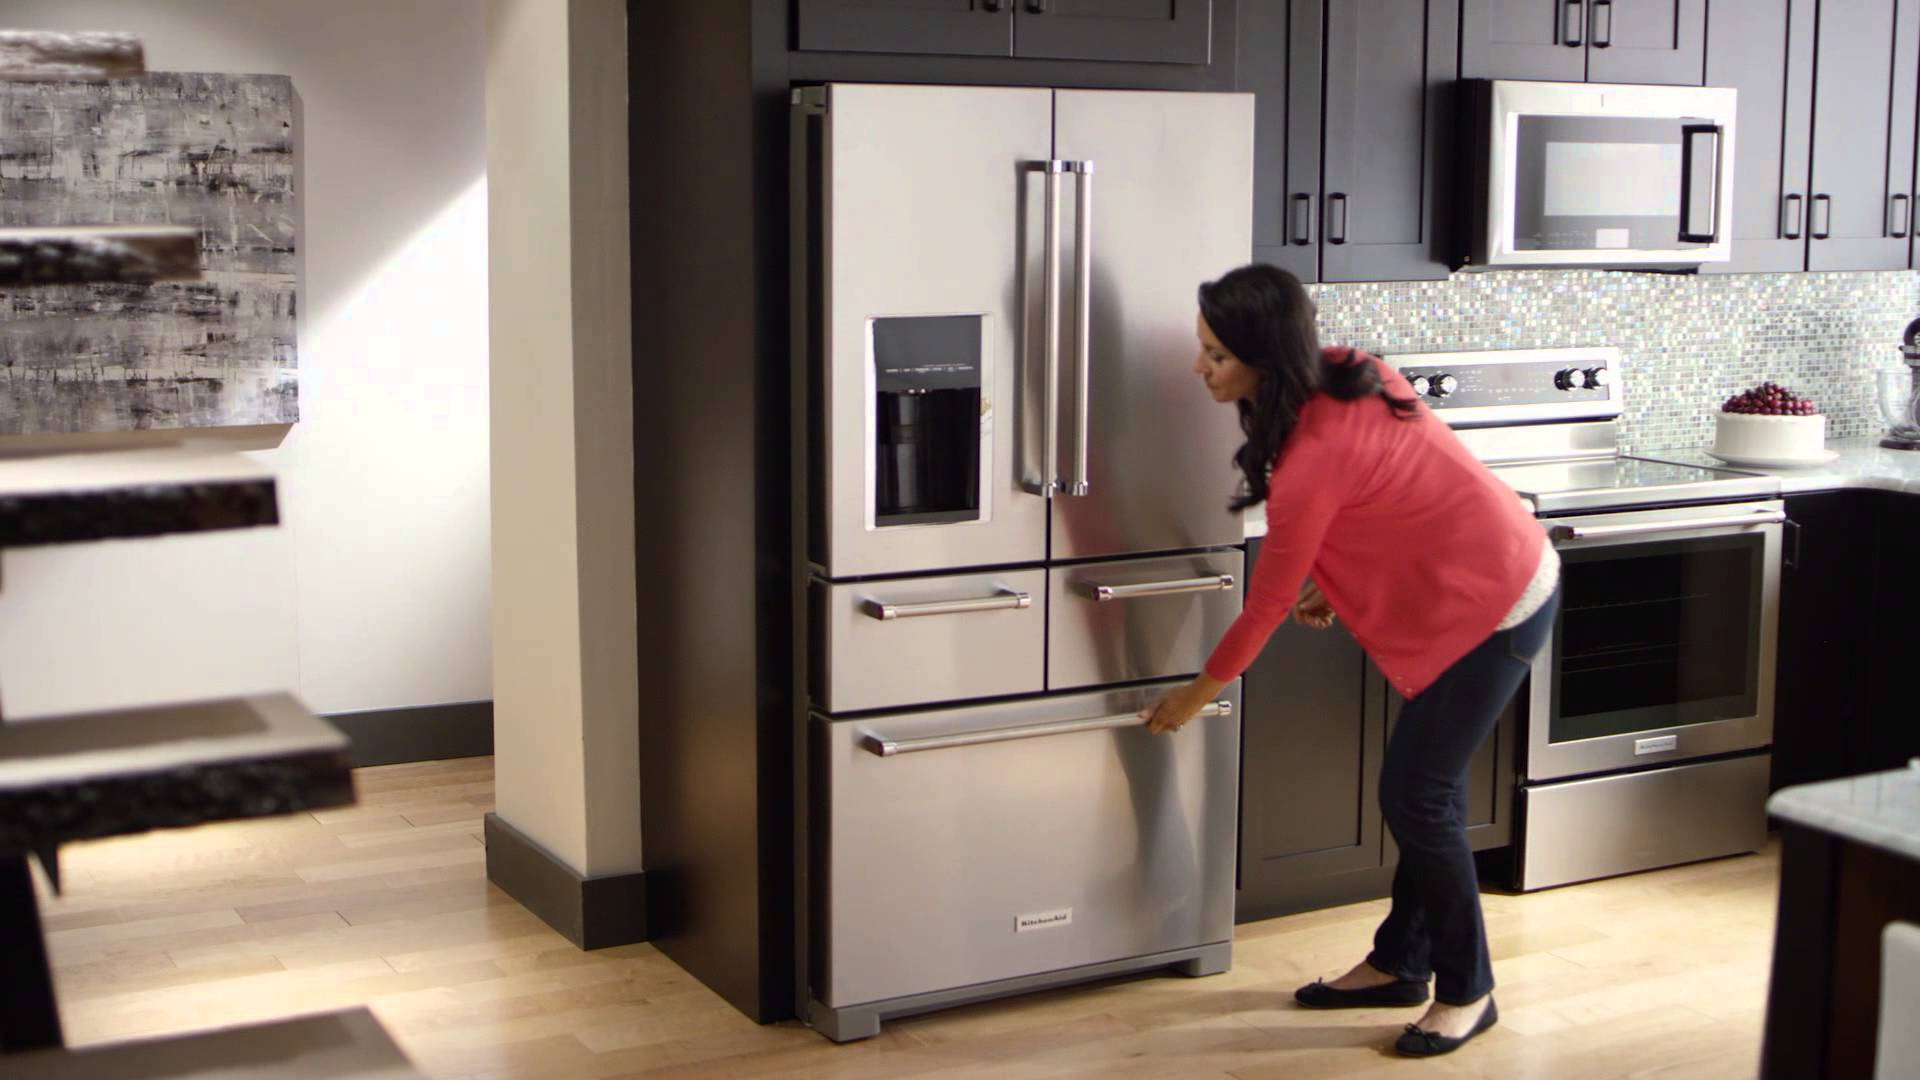 Kitchen Aid Refrigerator | Kitchenaid Major Appliances Design Inspiration Architecture